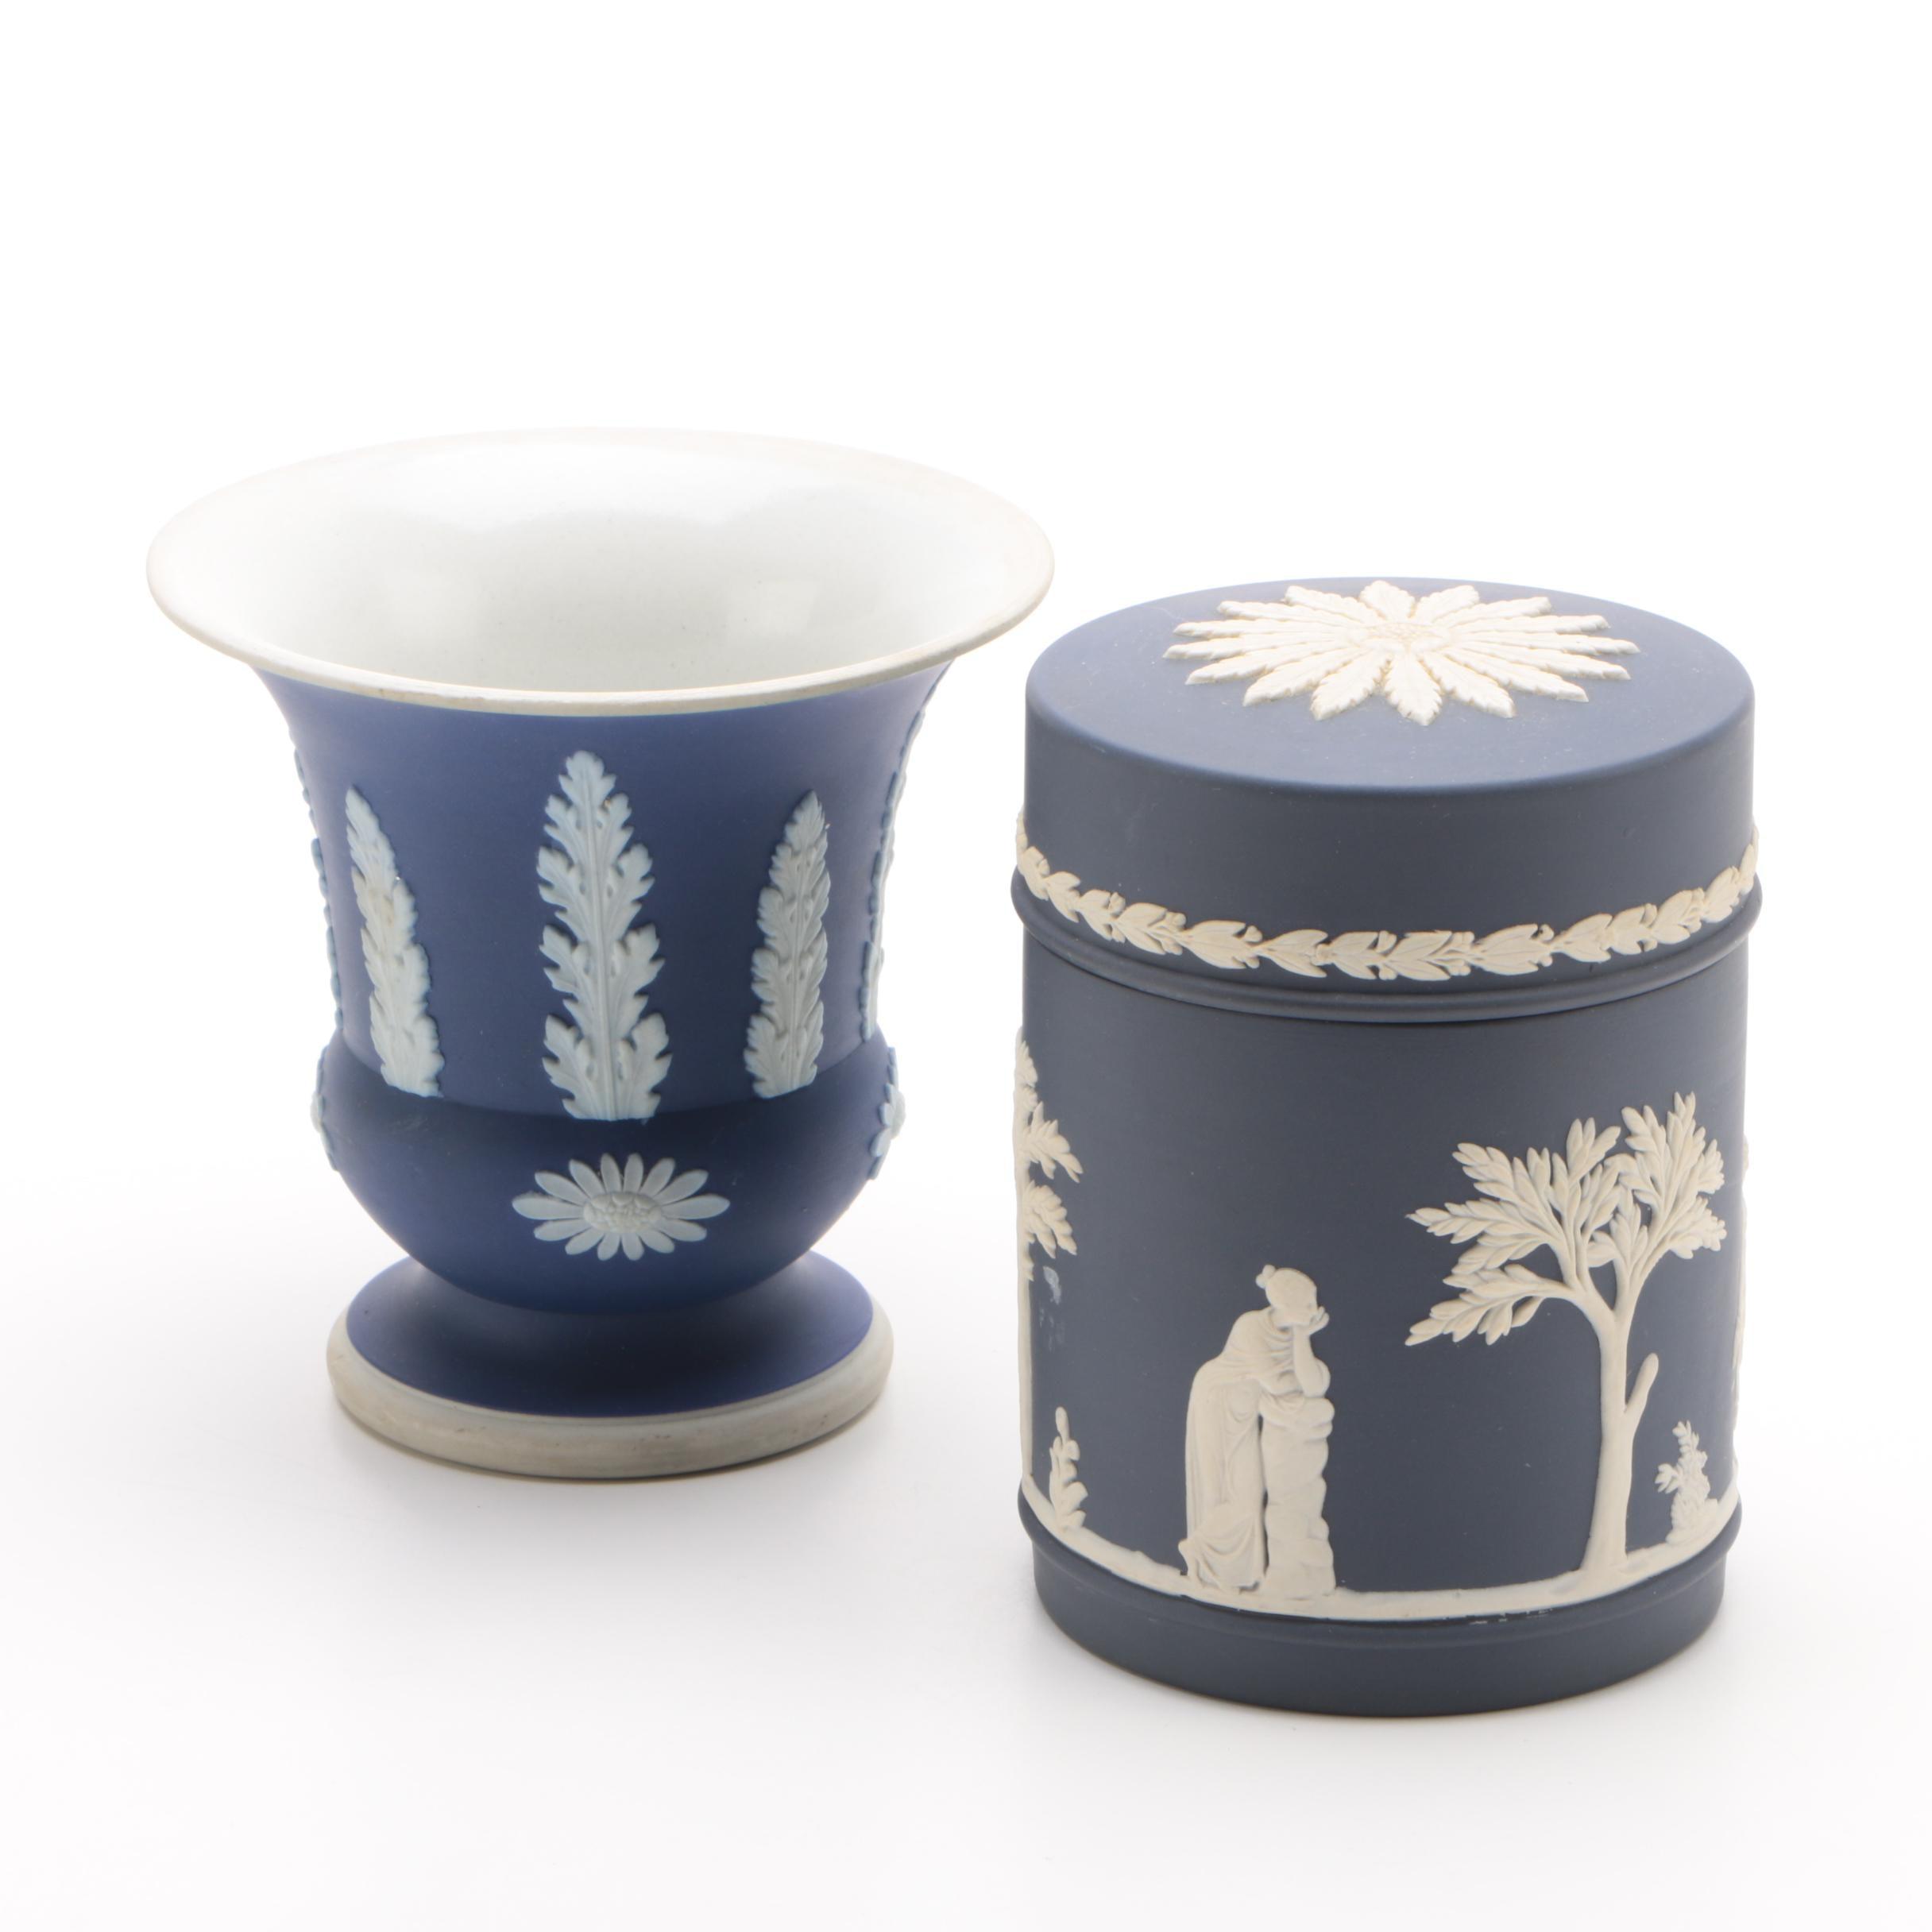 Wedgwood Jasperware Vase and Jar